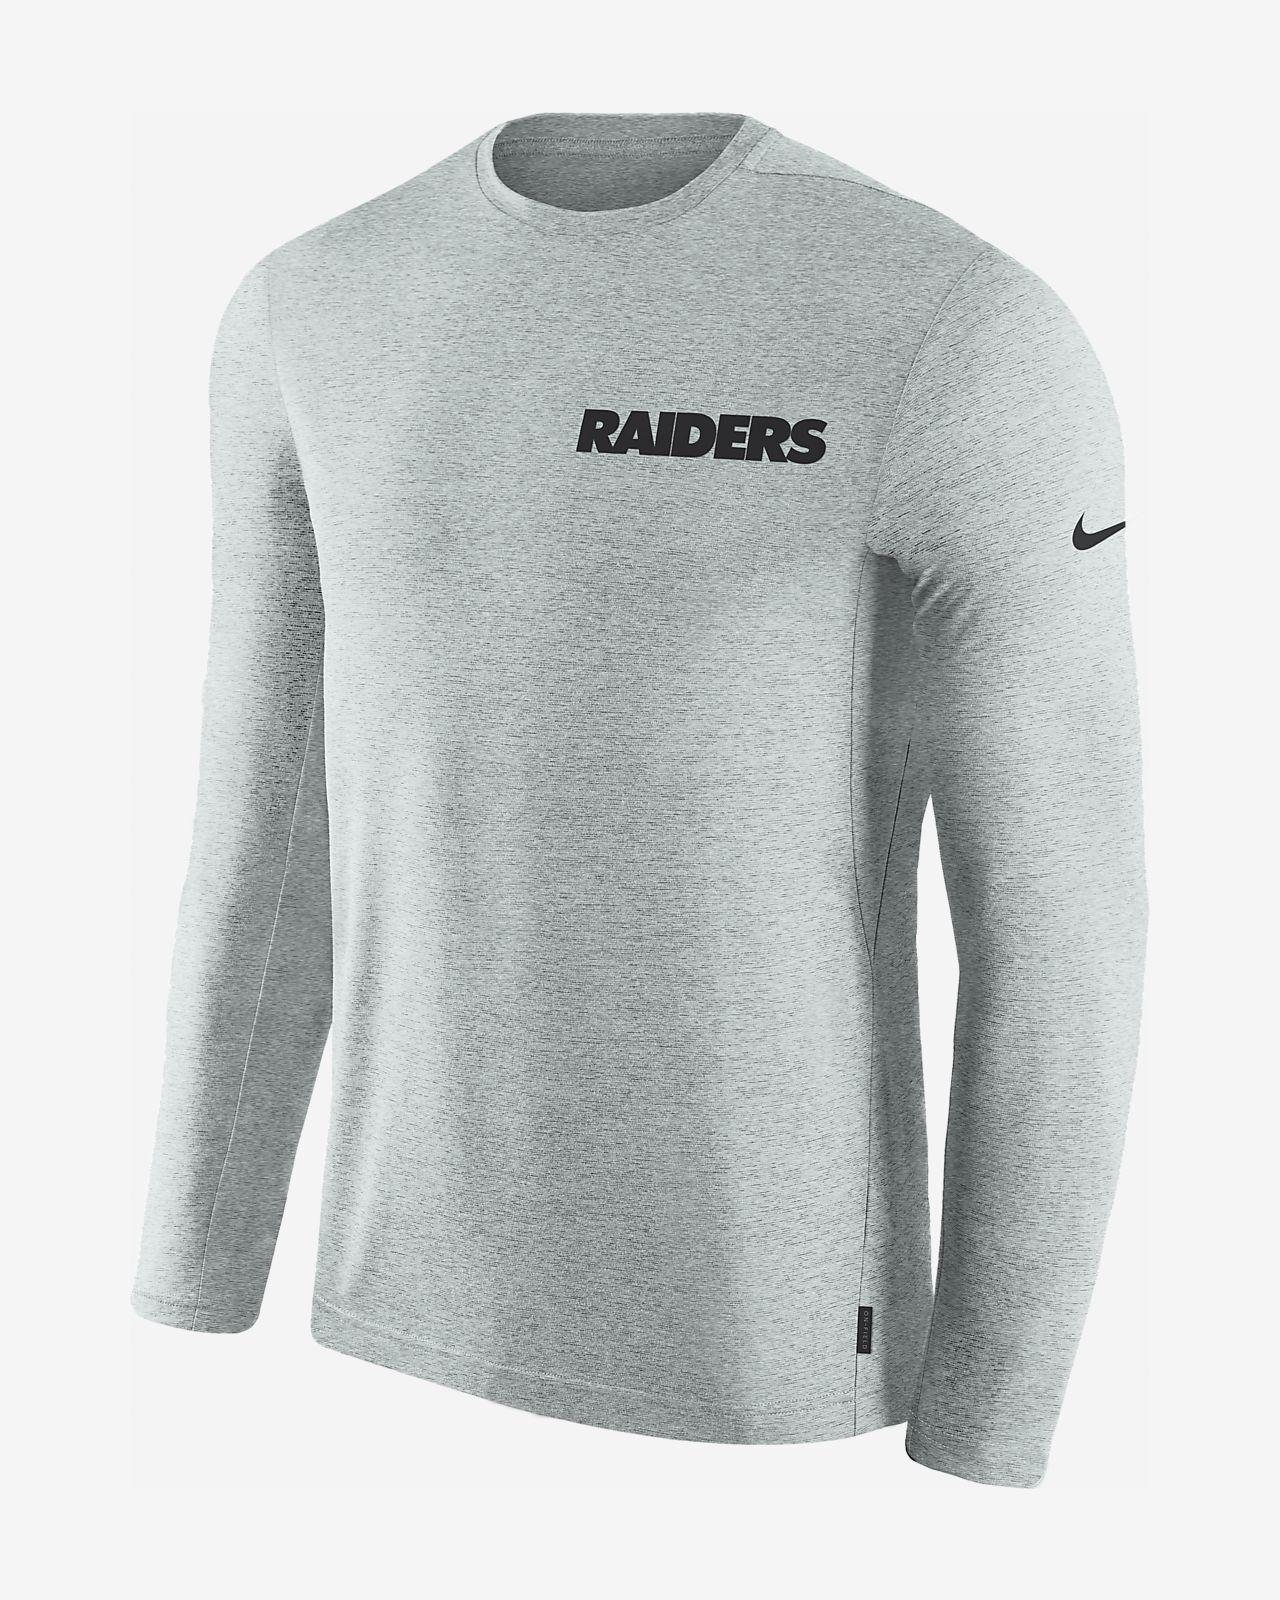 8e5bd351e6c9 Nike Dri-FIT Coach (NFL Raiders) Men s Long-Sleeve Top. Nike.com